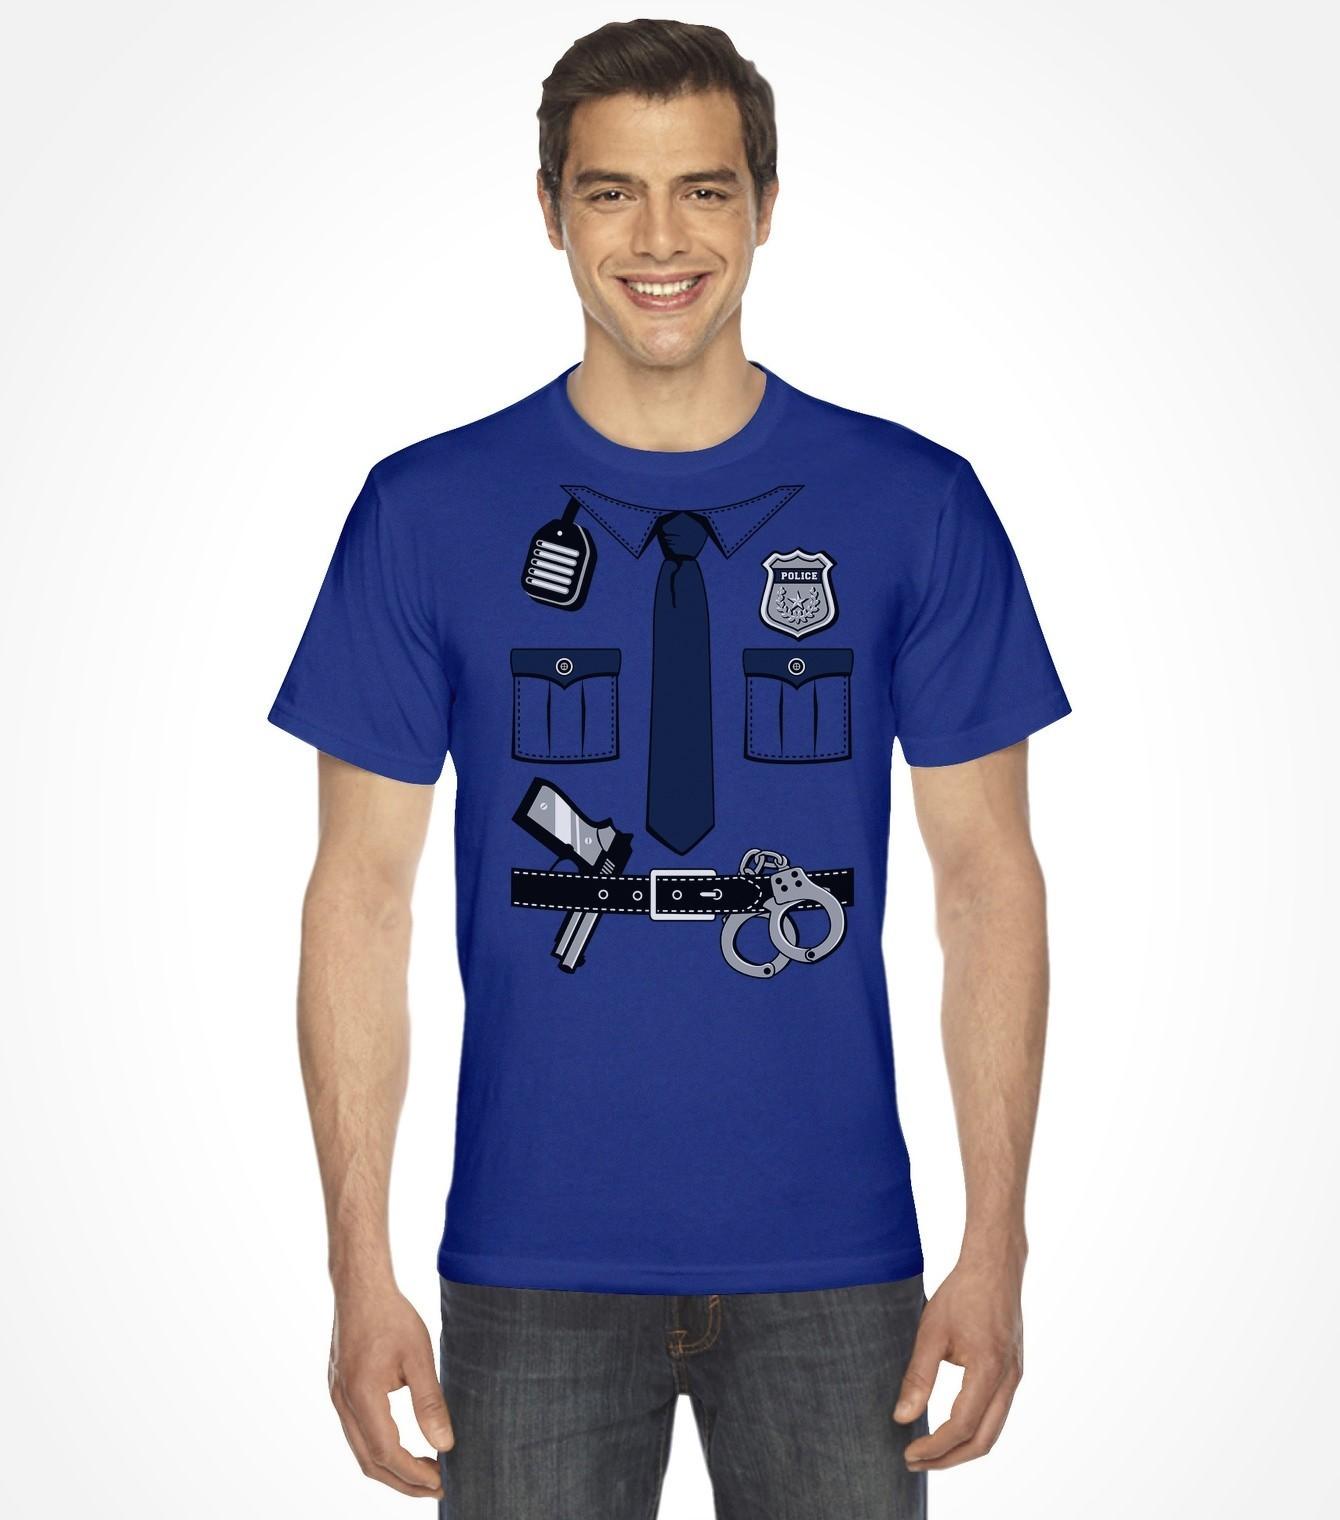 Police Cop Uniform Easy Purim Costume  sc 1 st  Israeli-T & Police Cop Uniform Easy Purim Costume - Israeli-T